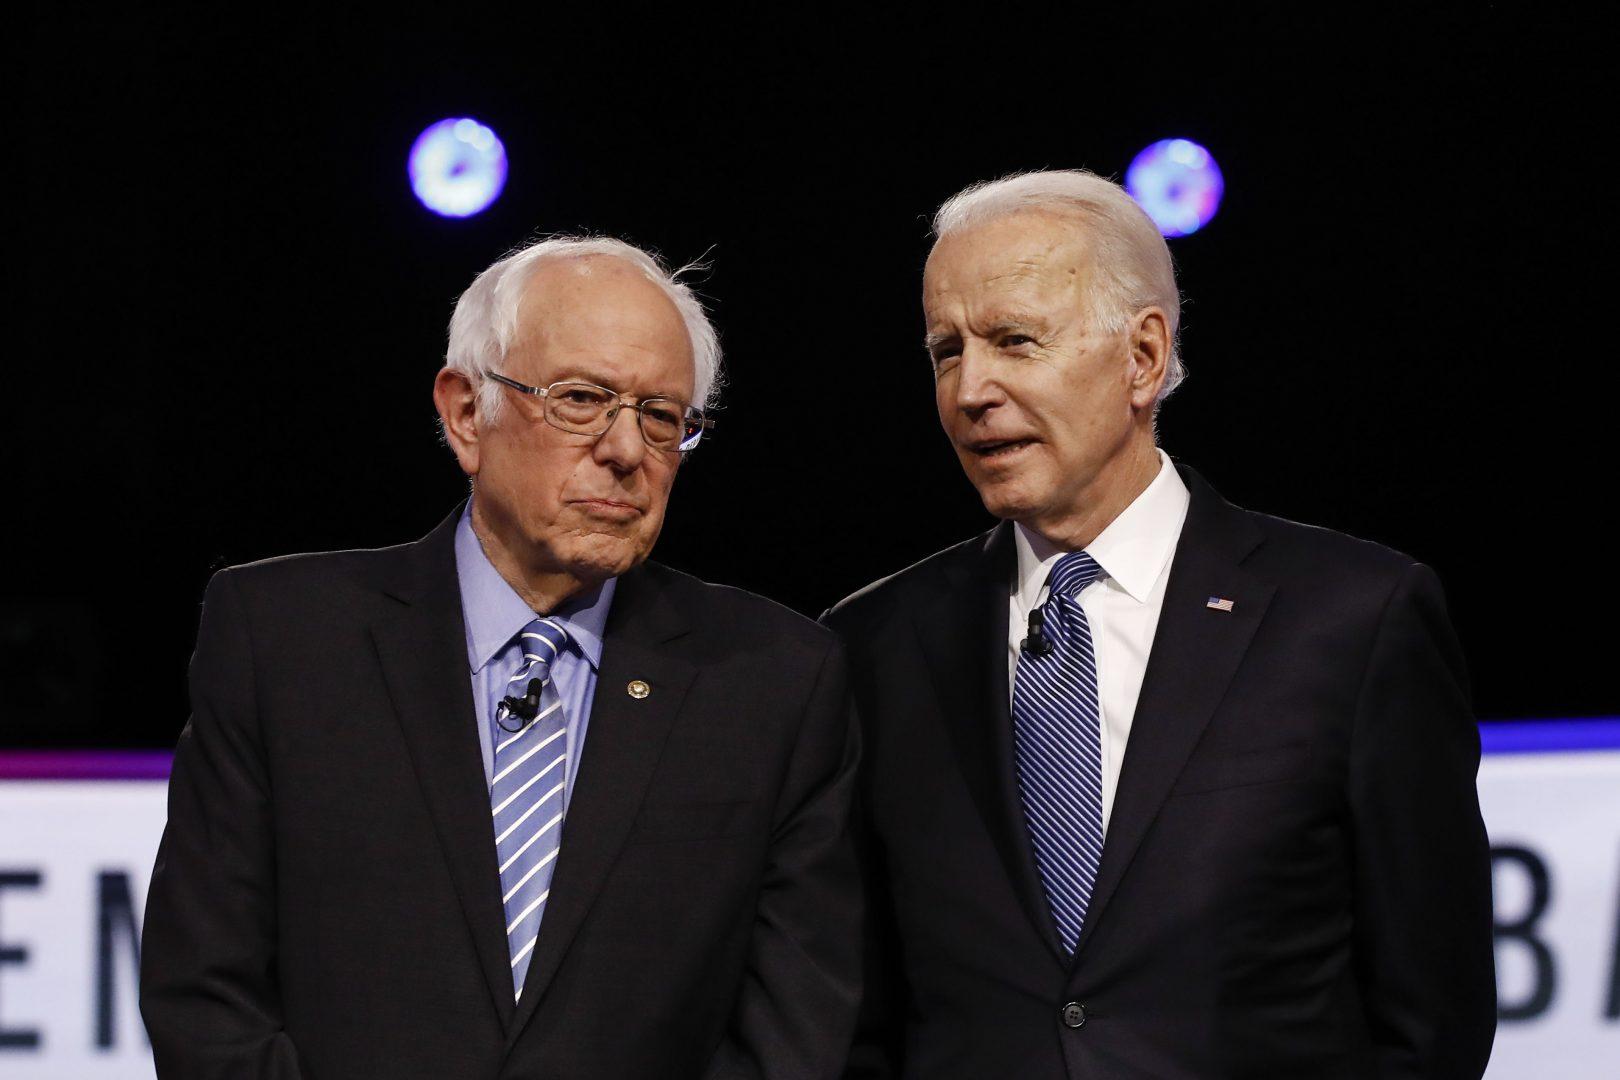 Sanders in Pittsburgh: Biden 'Opens the door for us to move forward' | WITF